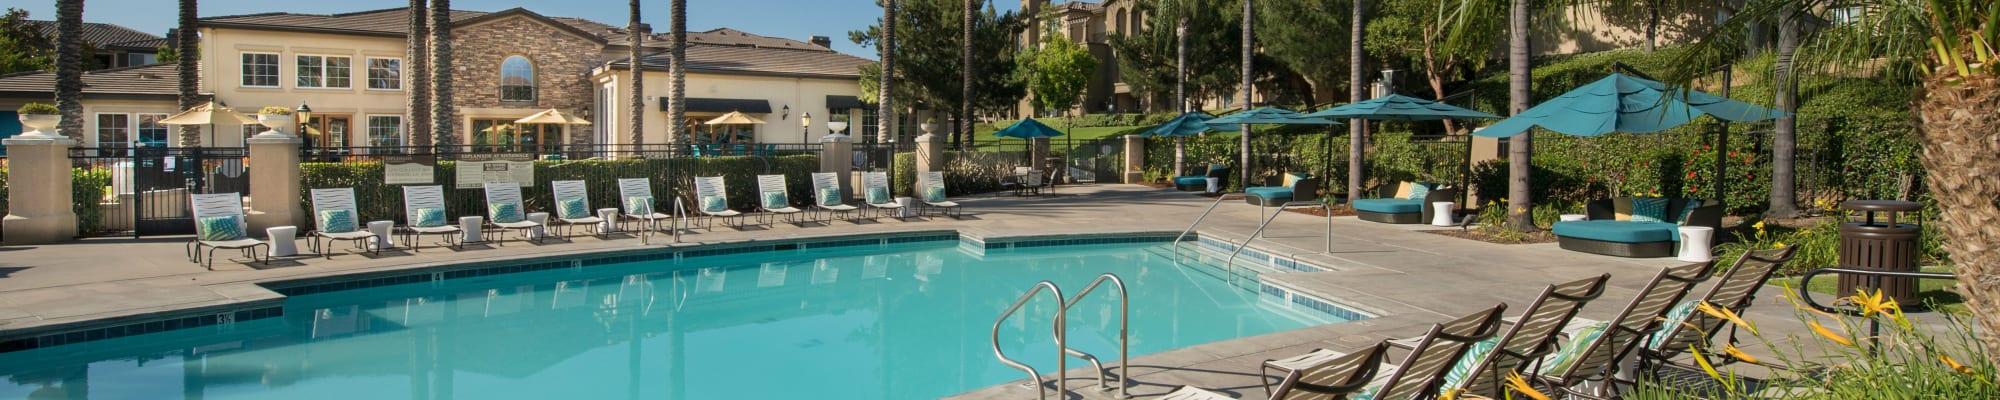 Community perks at Esplanade Apartment Homes in Riverside, California